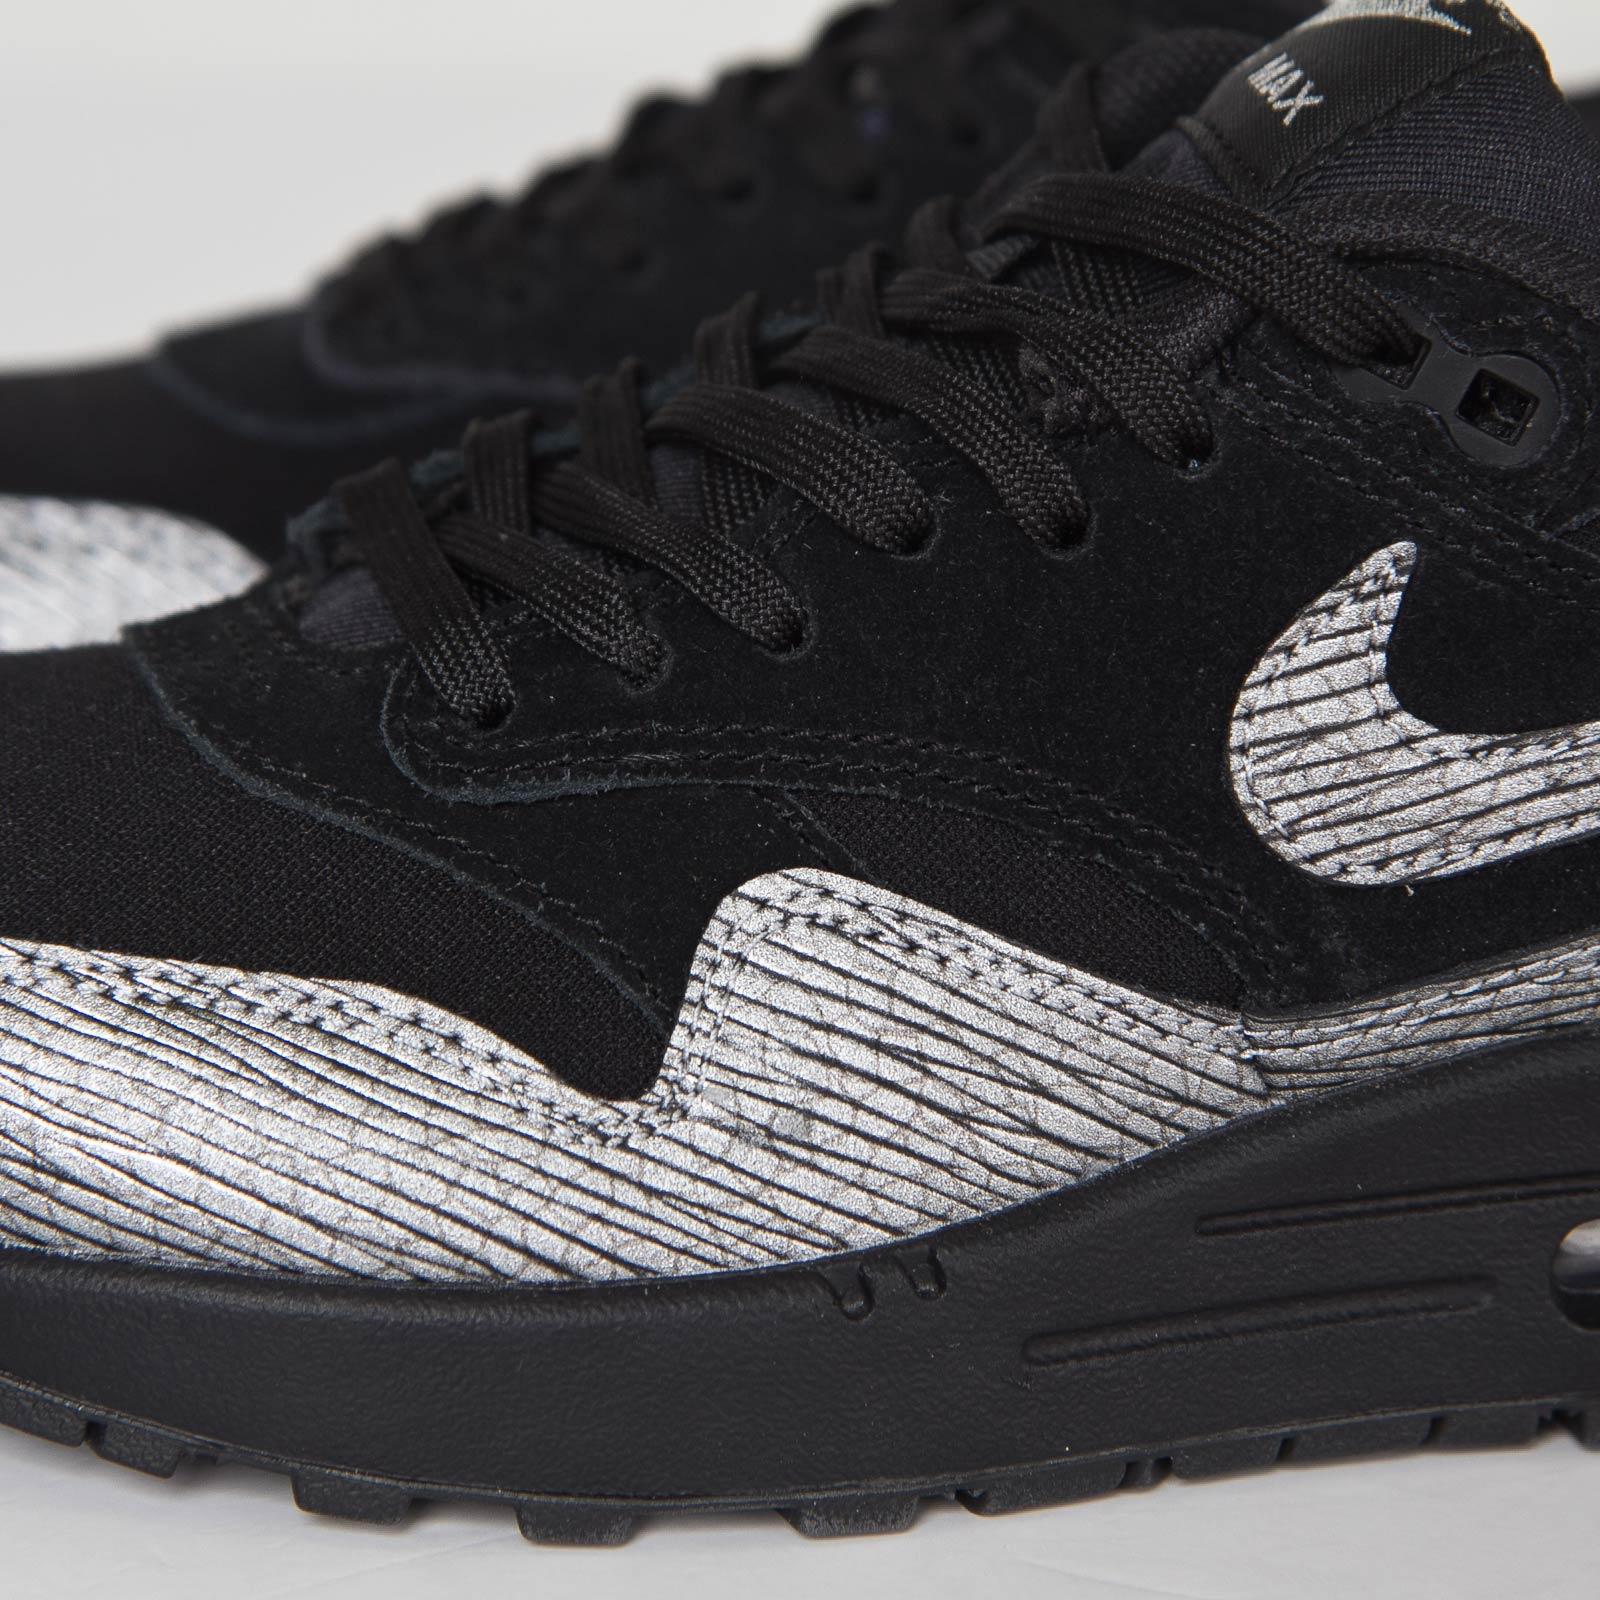 sale retailer bd18c 2d209 Nike Wmns Air Max 1 Premium - 6. Close